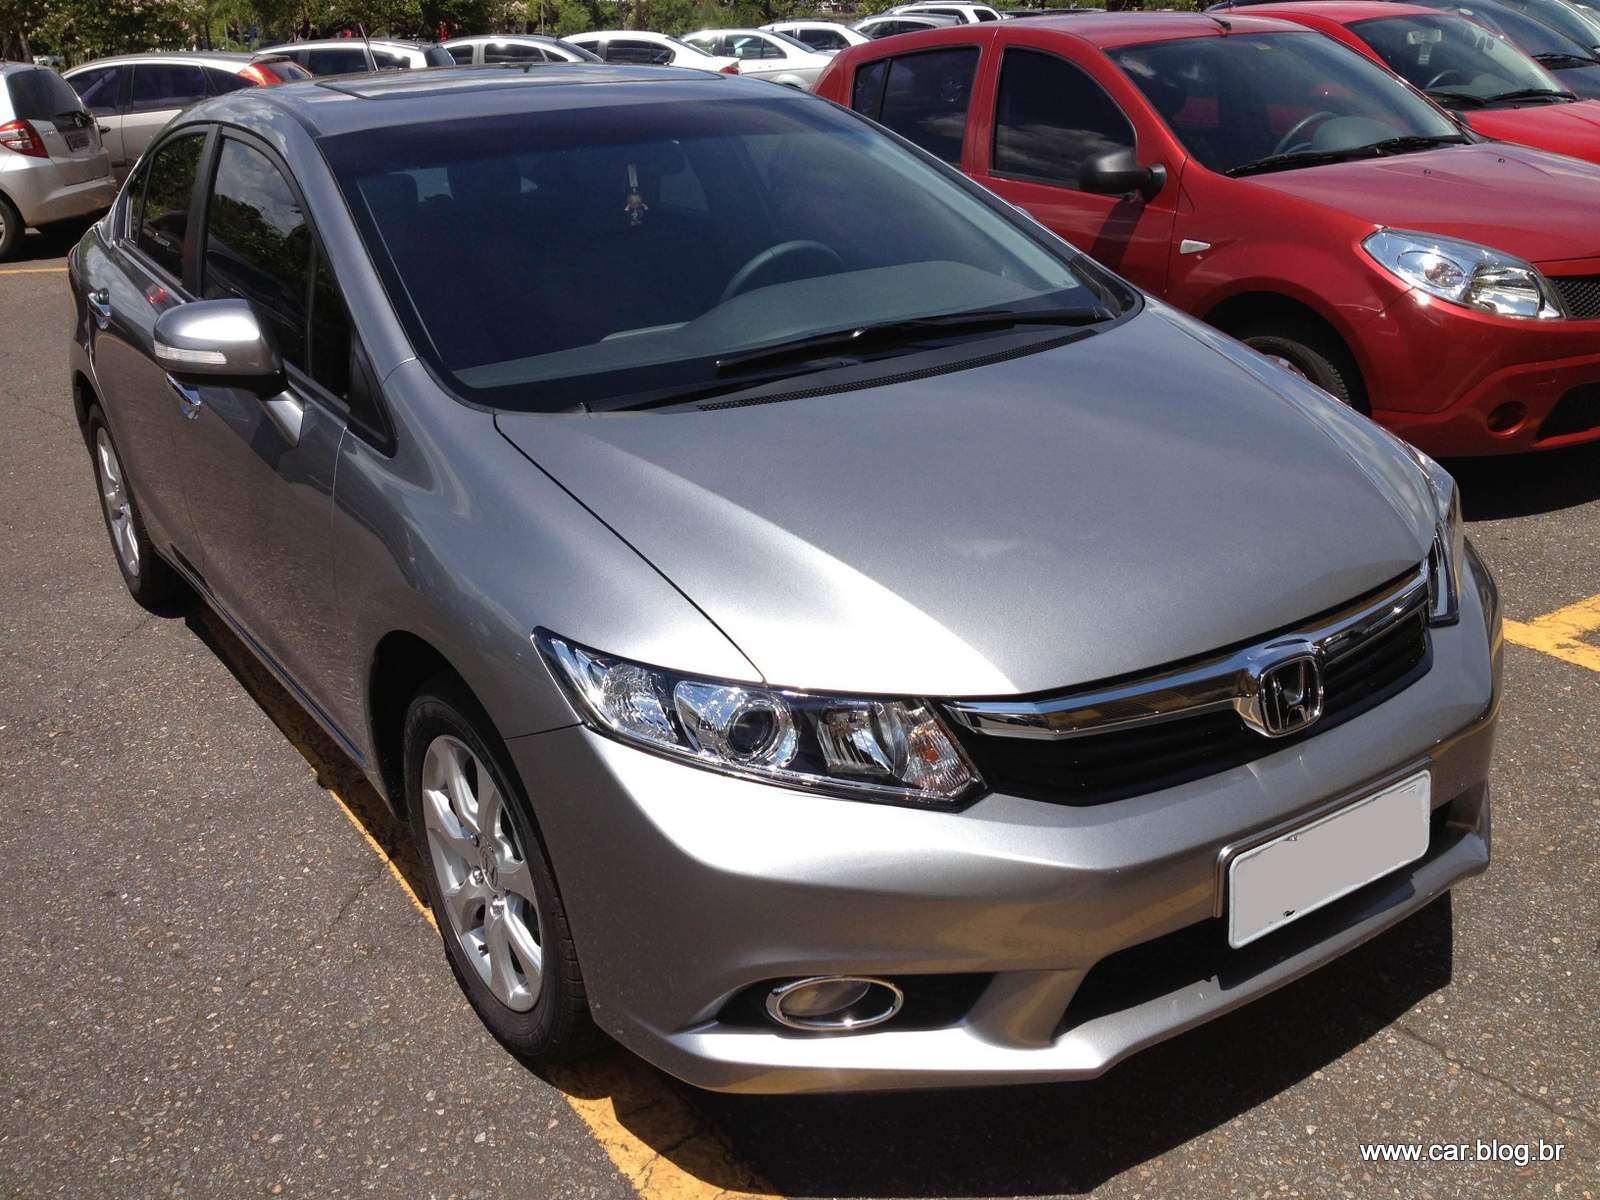 Novo Honda Civic 2.0 2014 EX-R